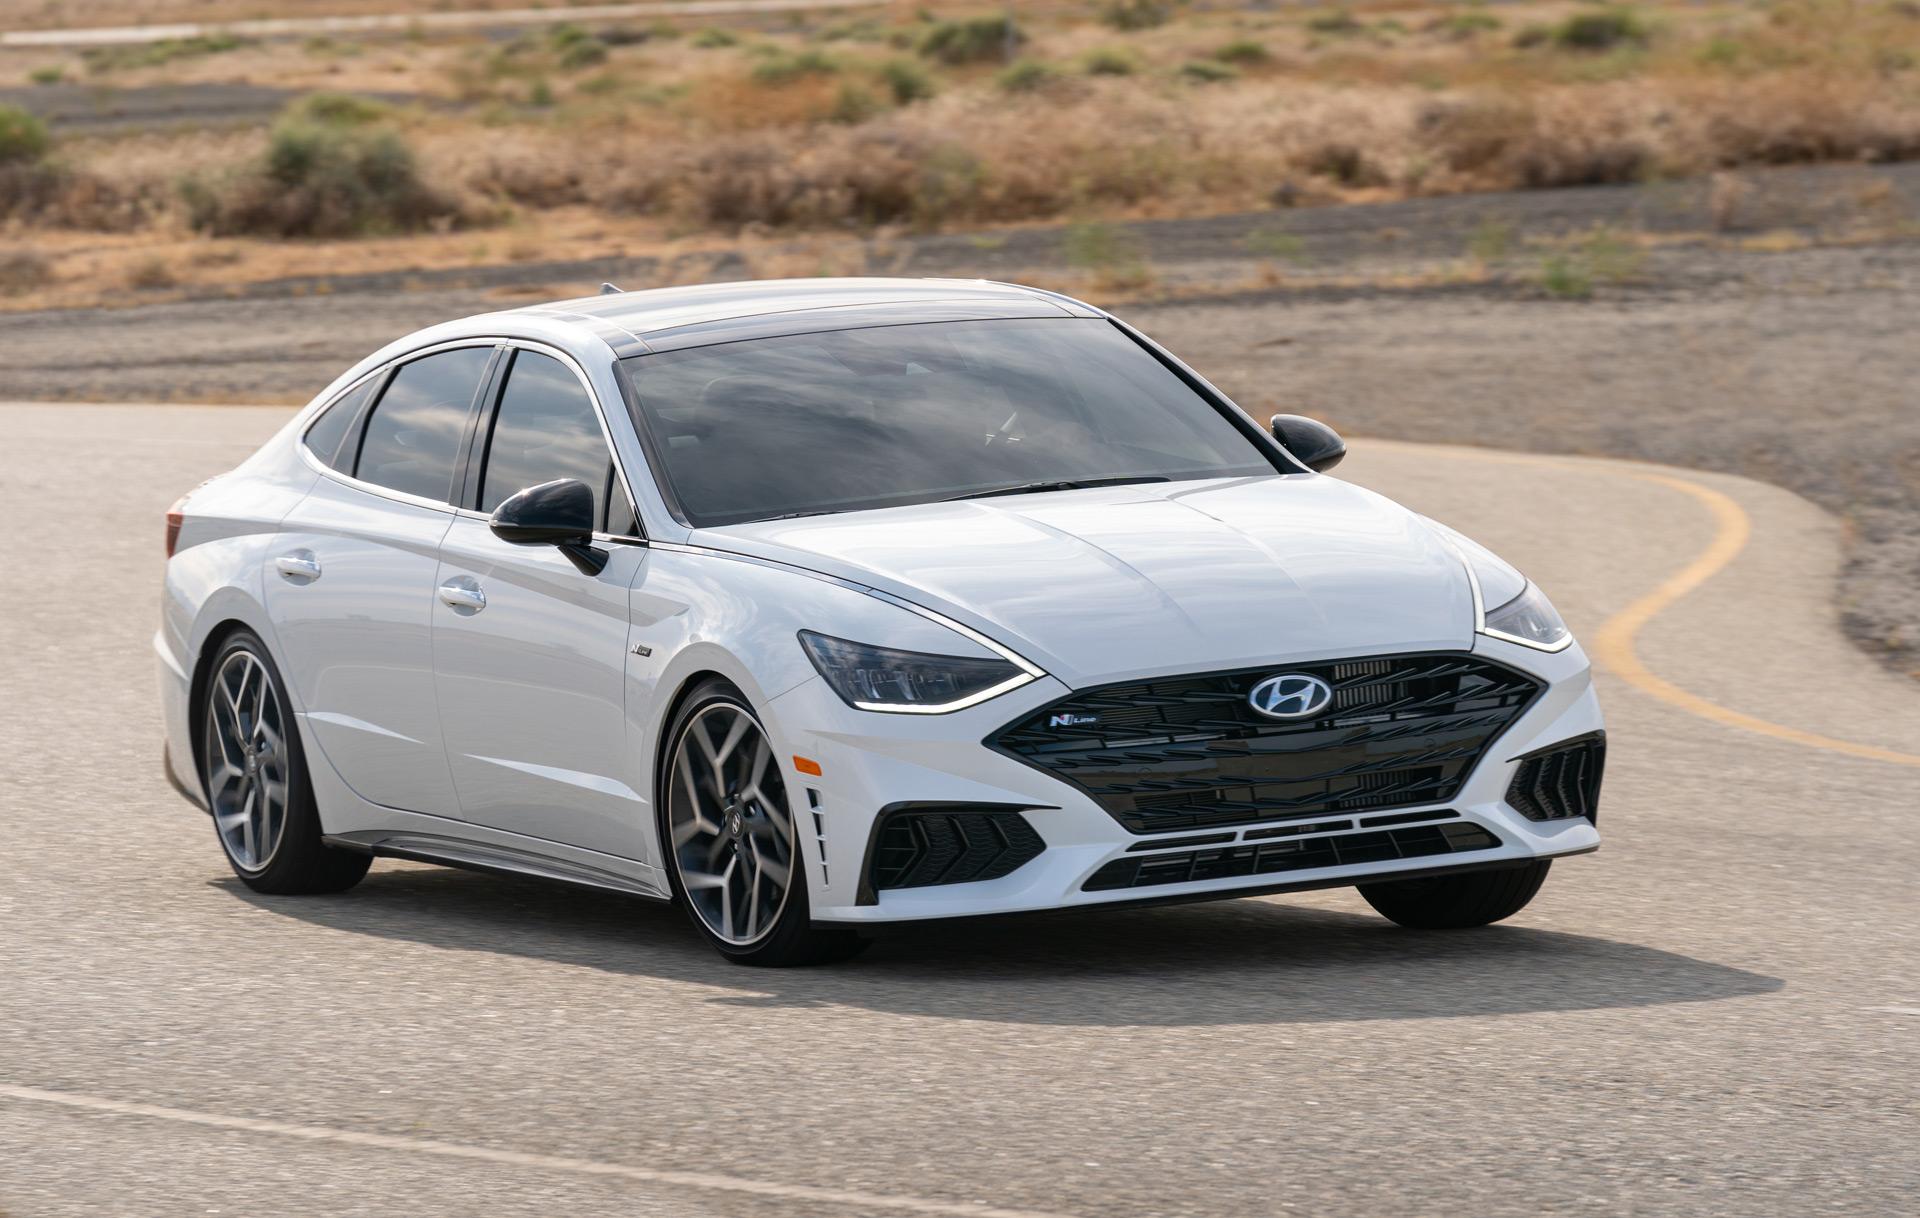 2021 Hyundai Sonata gears up with N Line performance trim